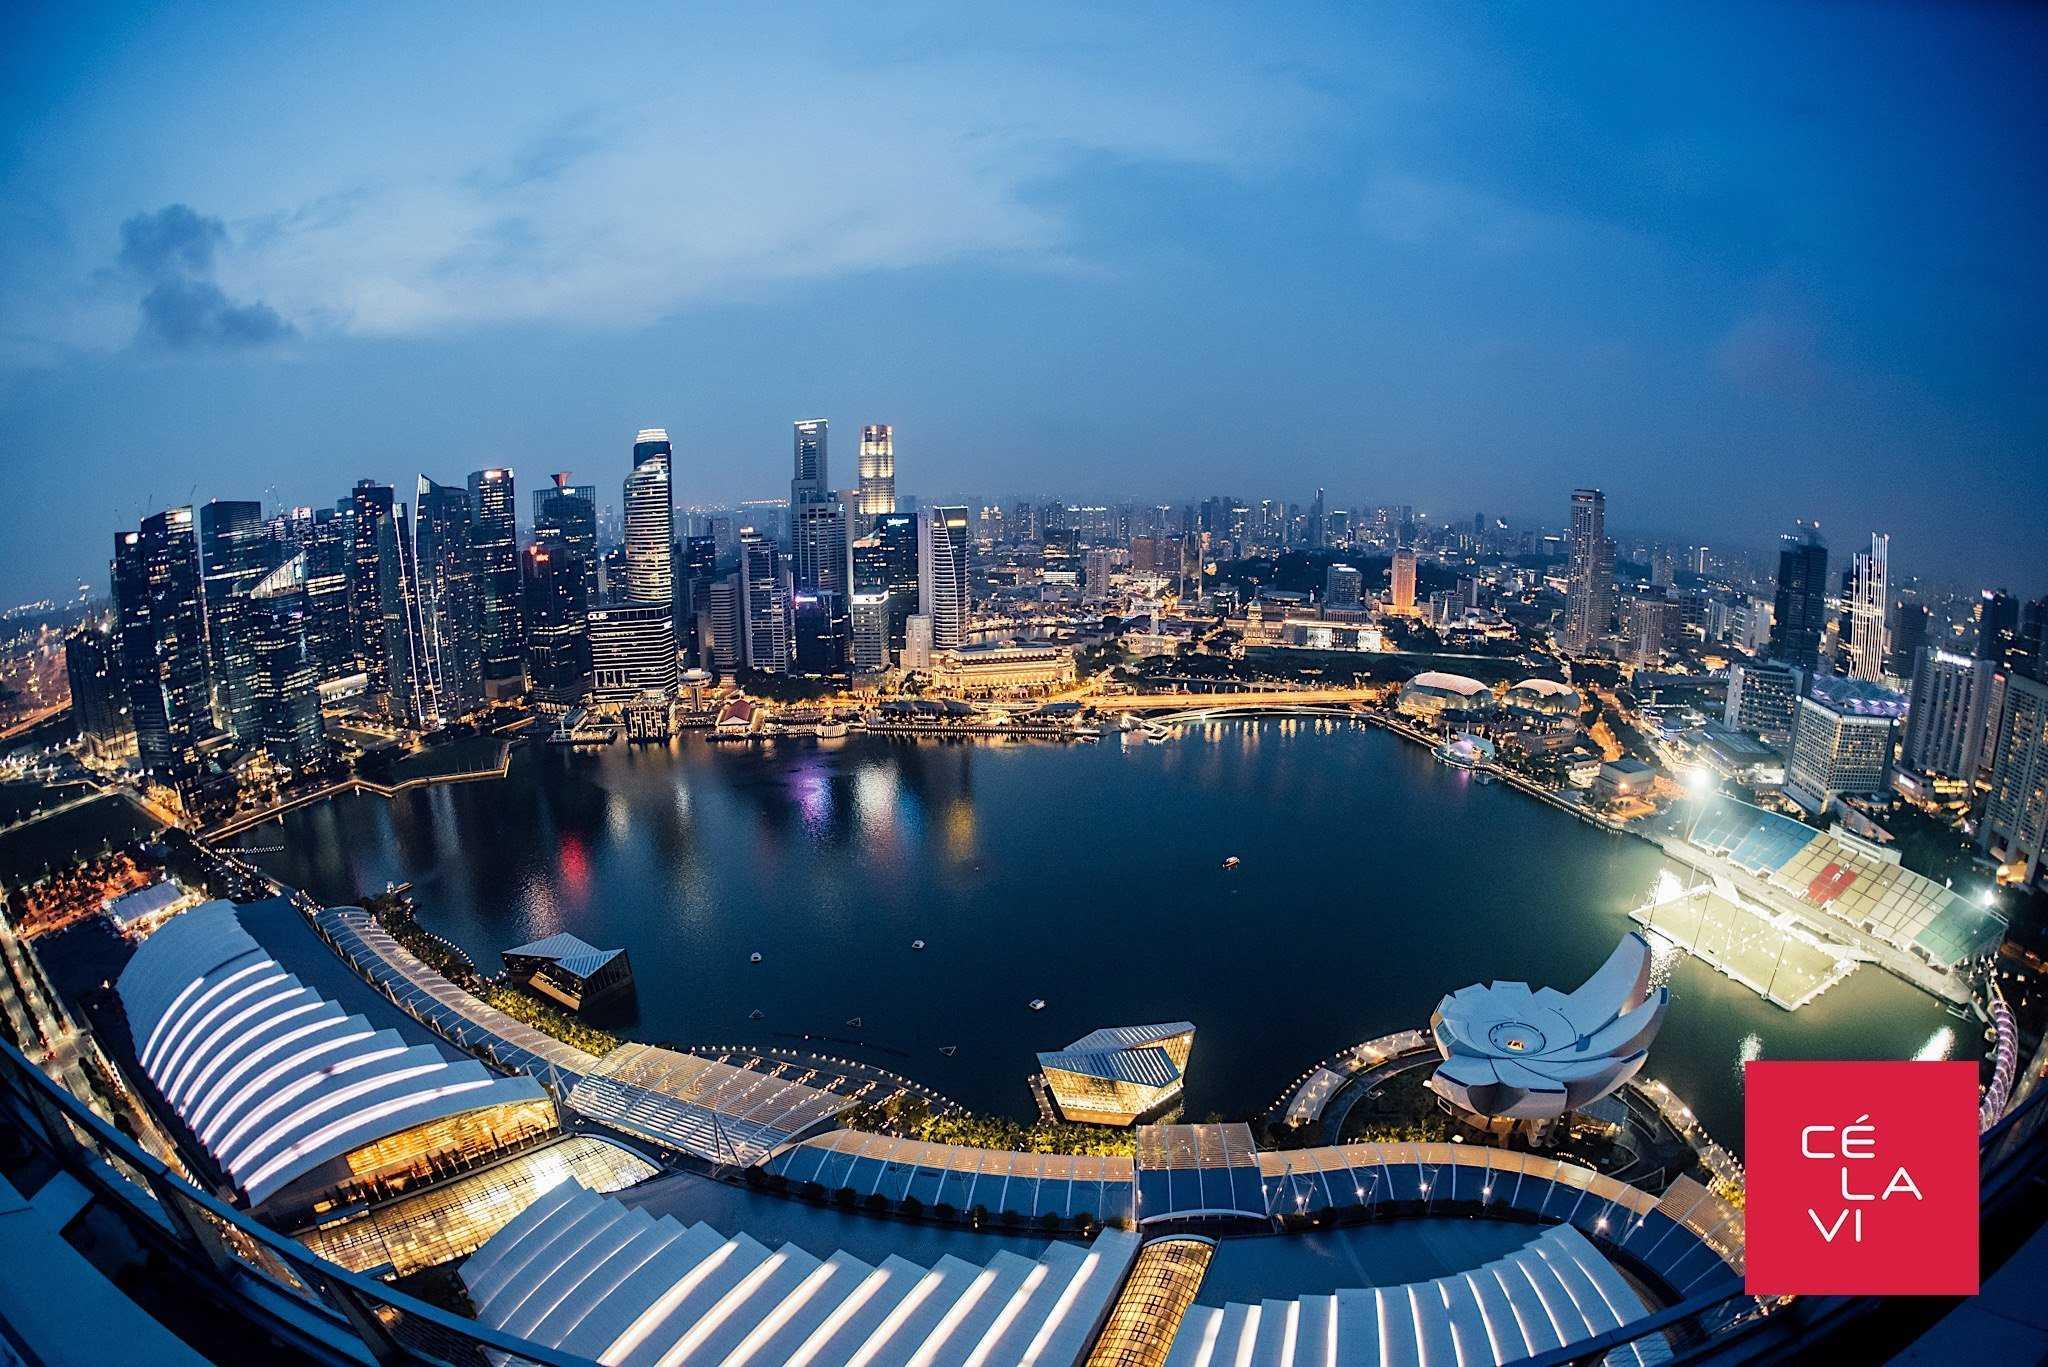 Ce La Vi Singapore